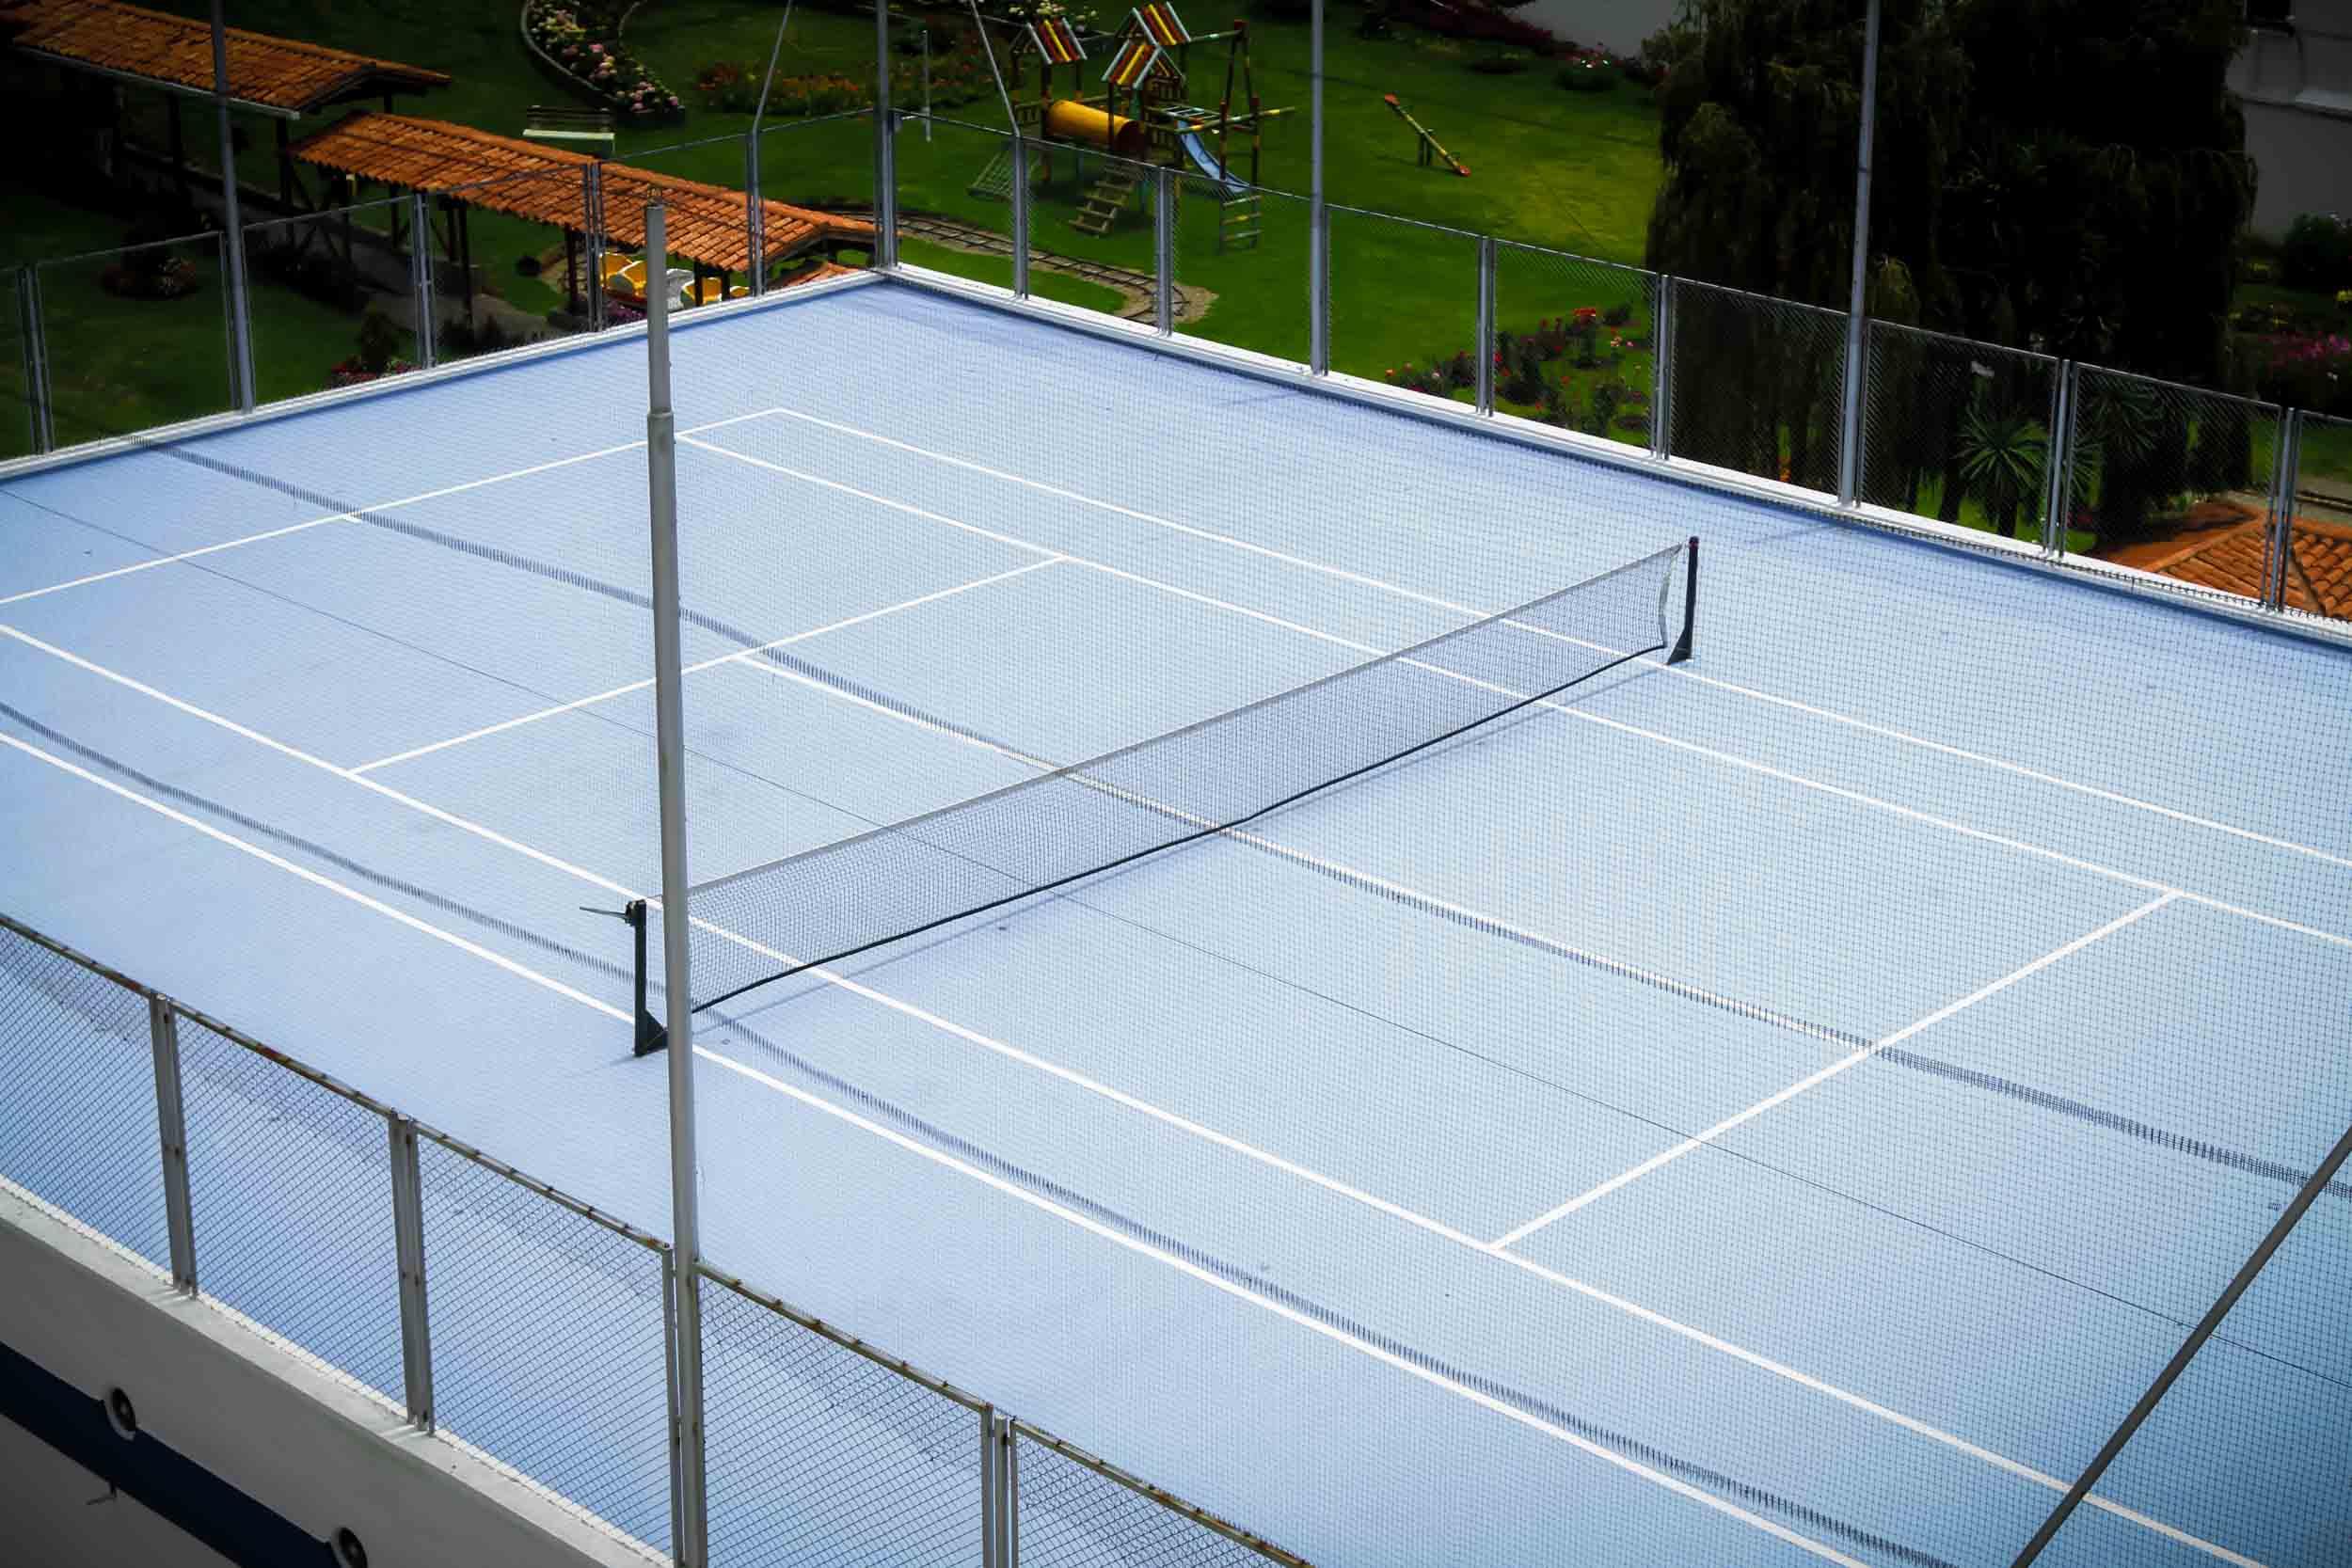 image-cancha de tenis001